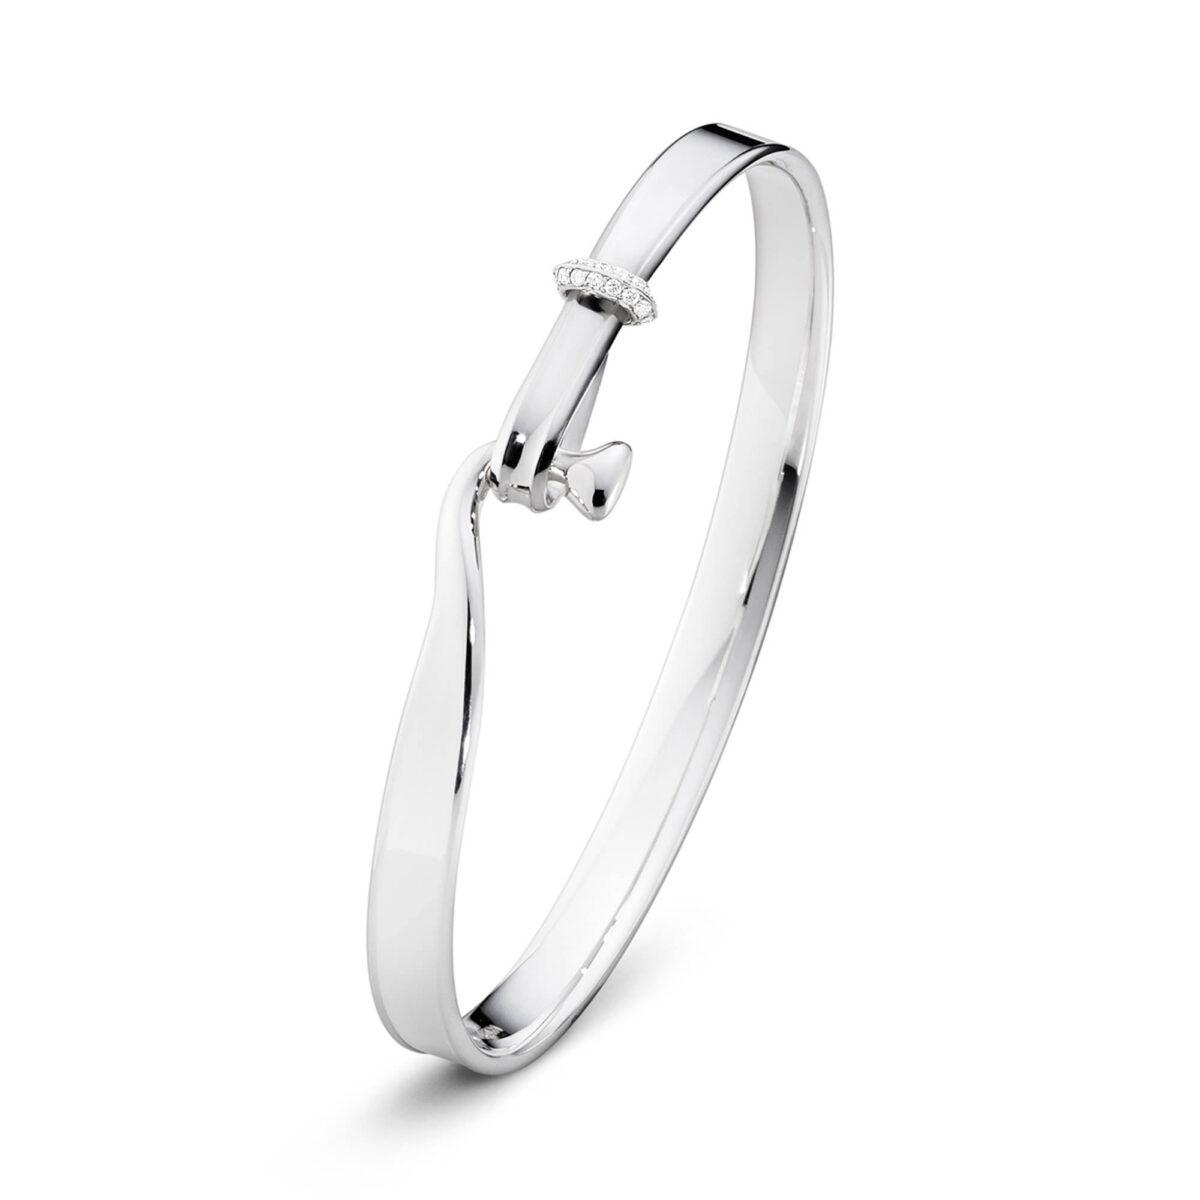 product/3/5/3531180_torun_bangle_204_silver_wg-1.jpg